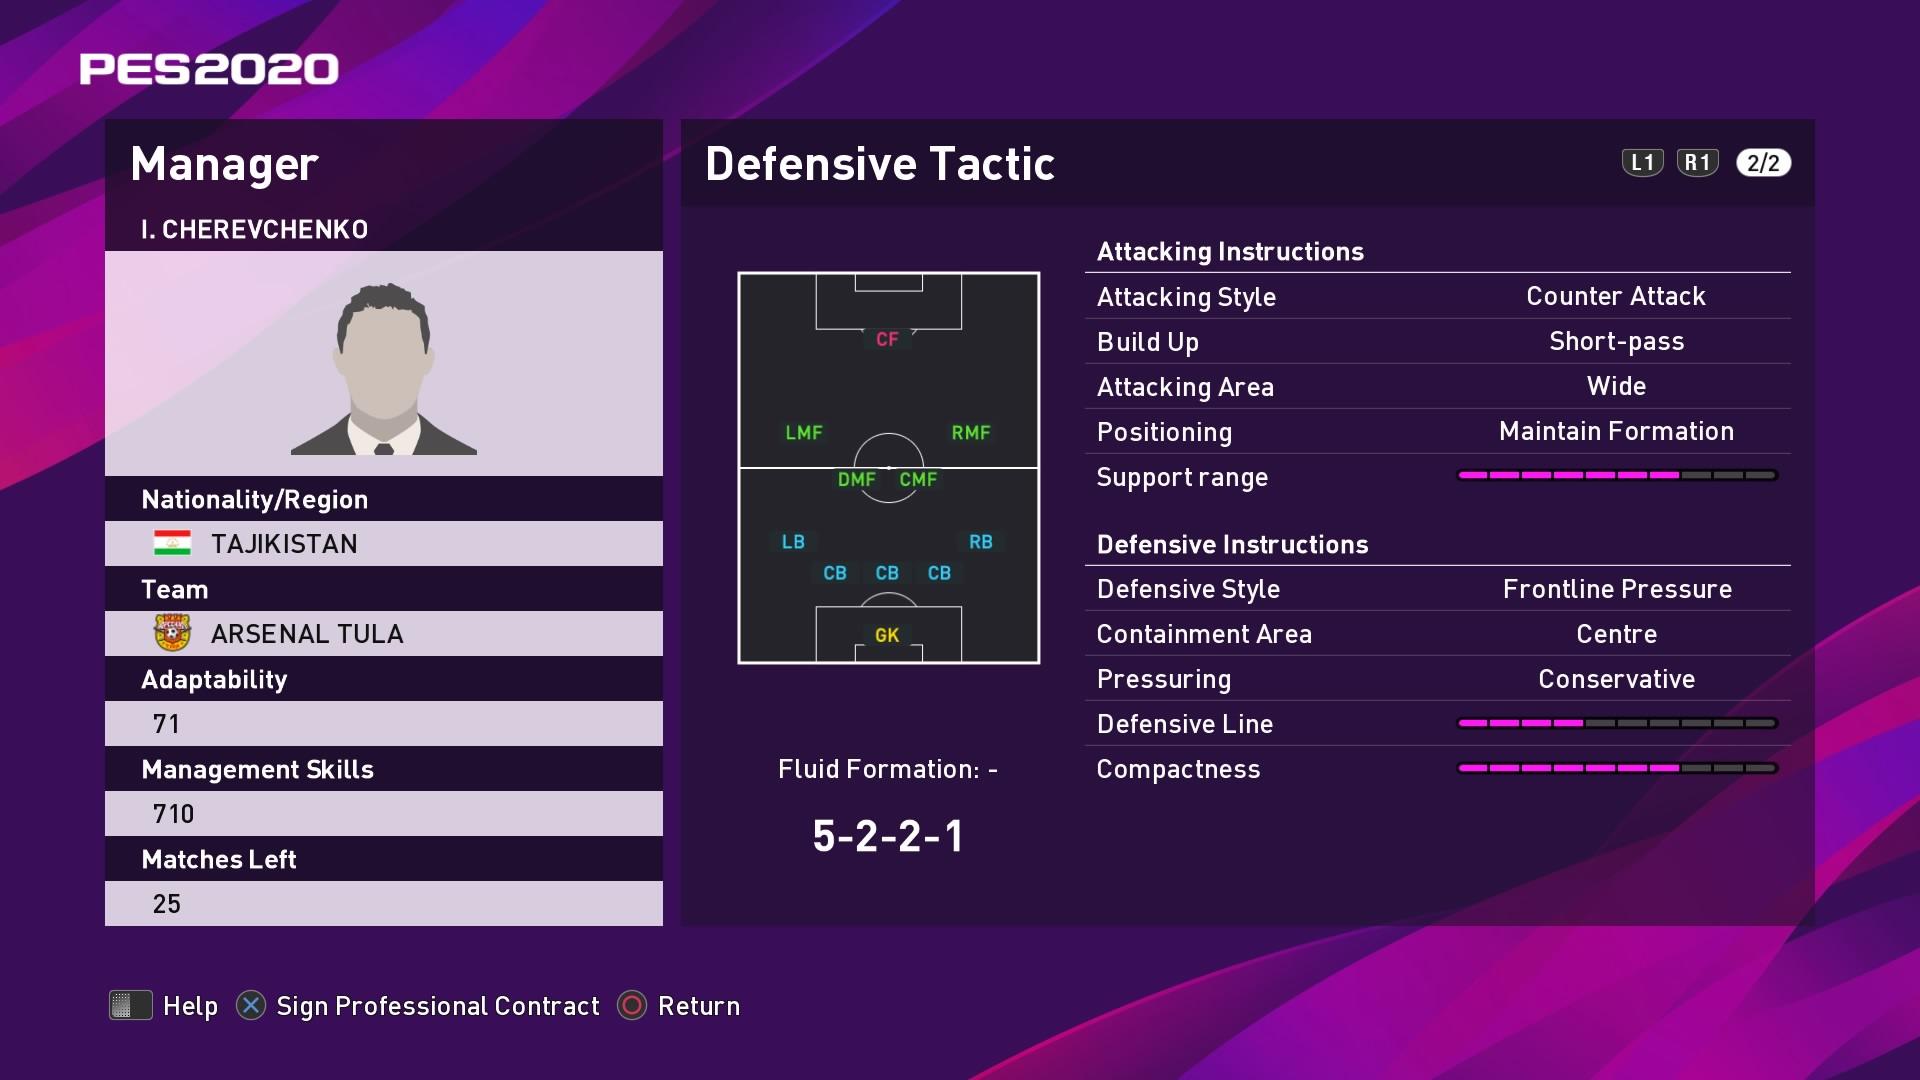 I. Cherevchenko (Igor Cherevchenko) Defensive Tactic in PES 2020 myClub